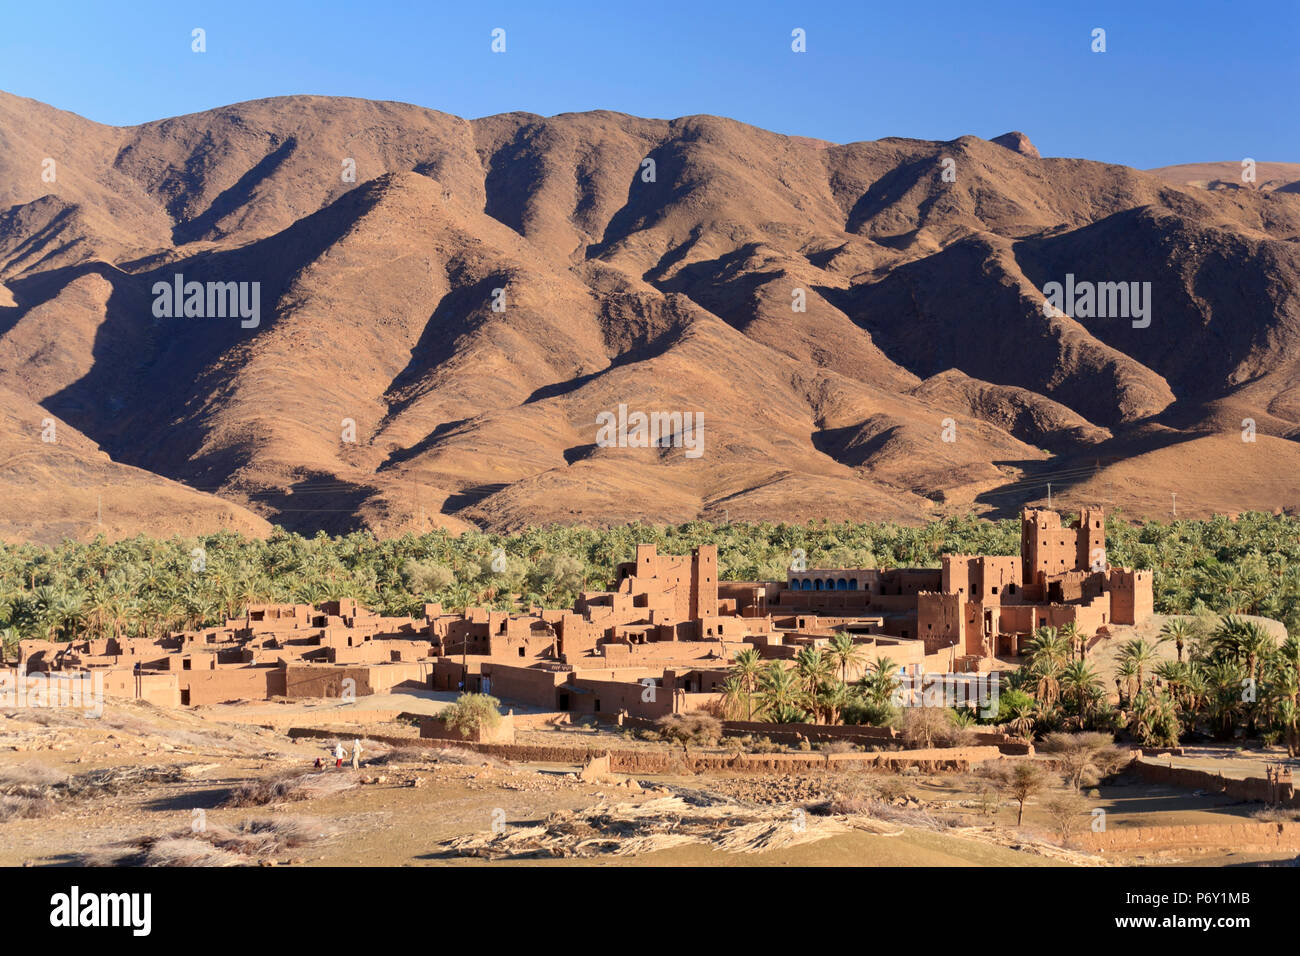 Le Maroc, vallée du Drâa, la Kasbah Tamnougalt Photo Stock